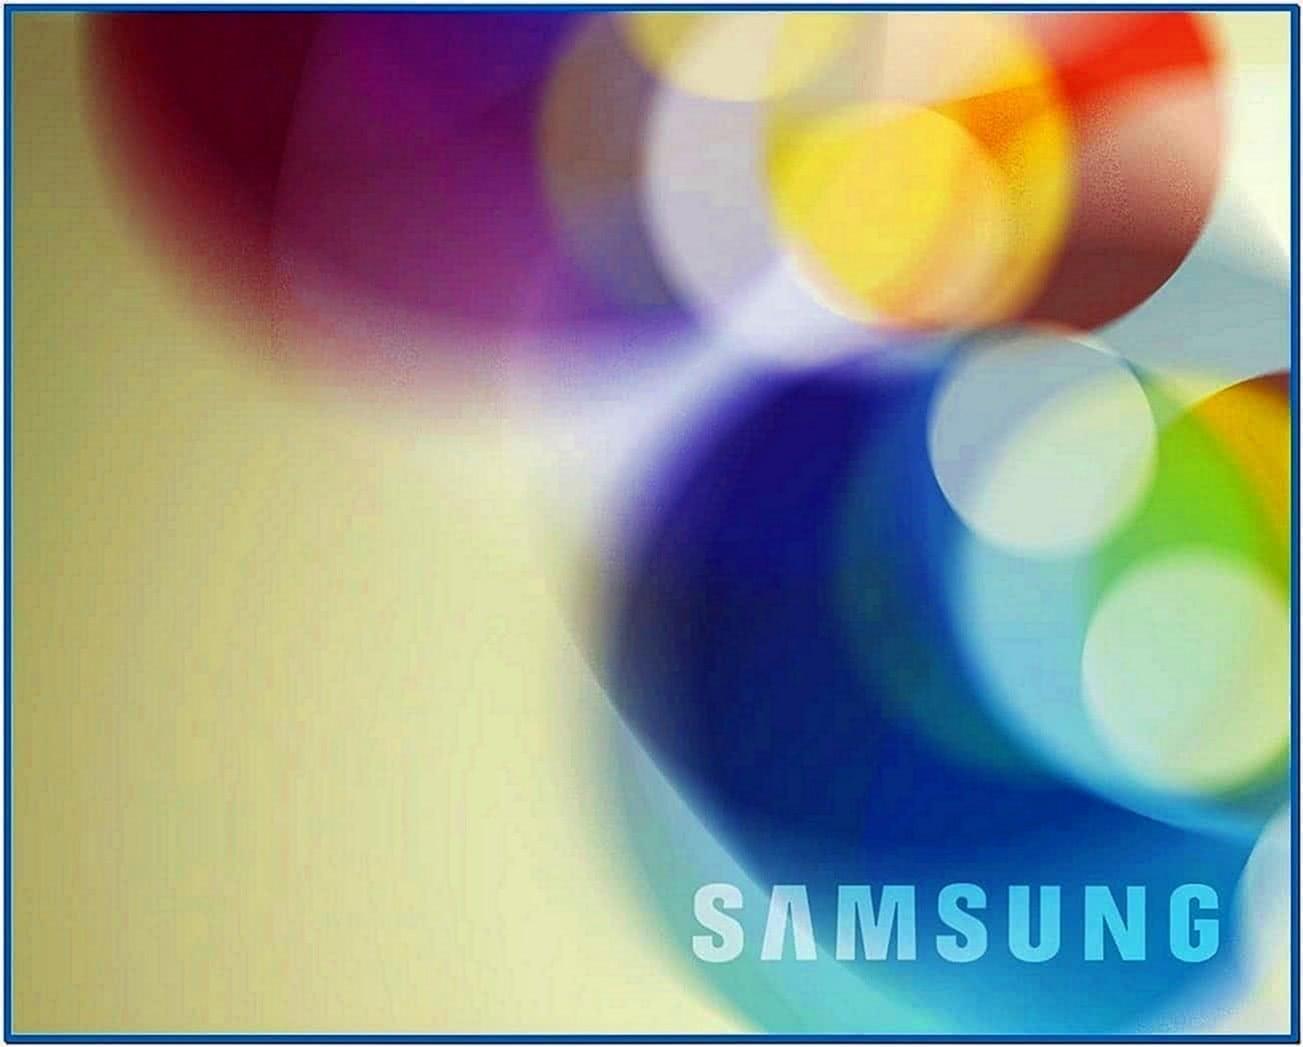 HD Screensaver for Samsung TV